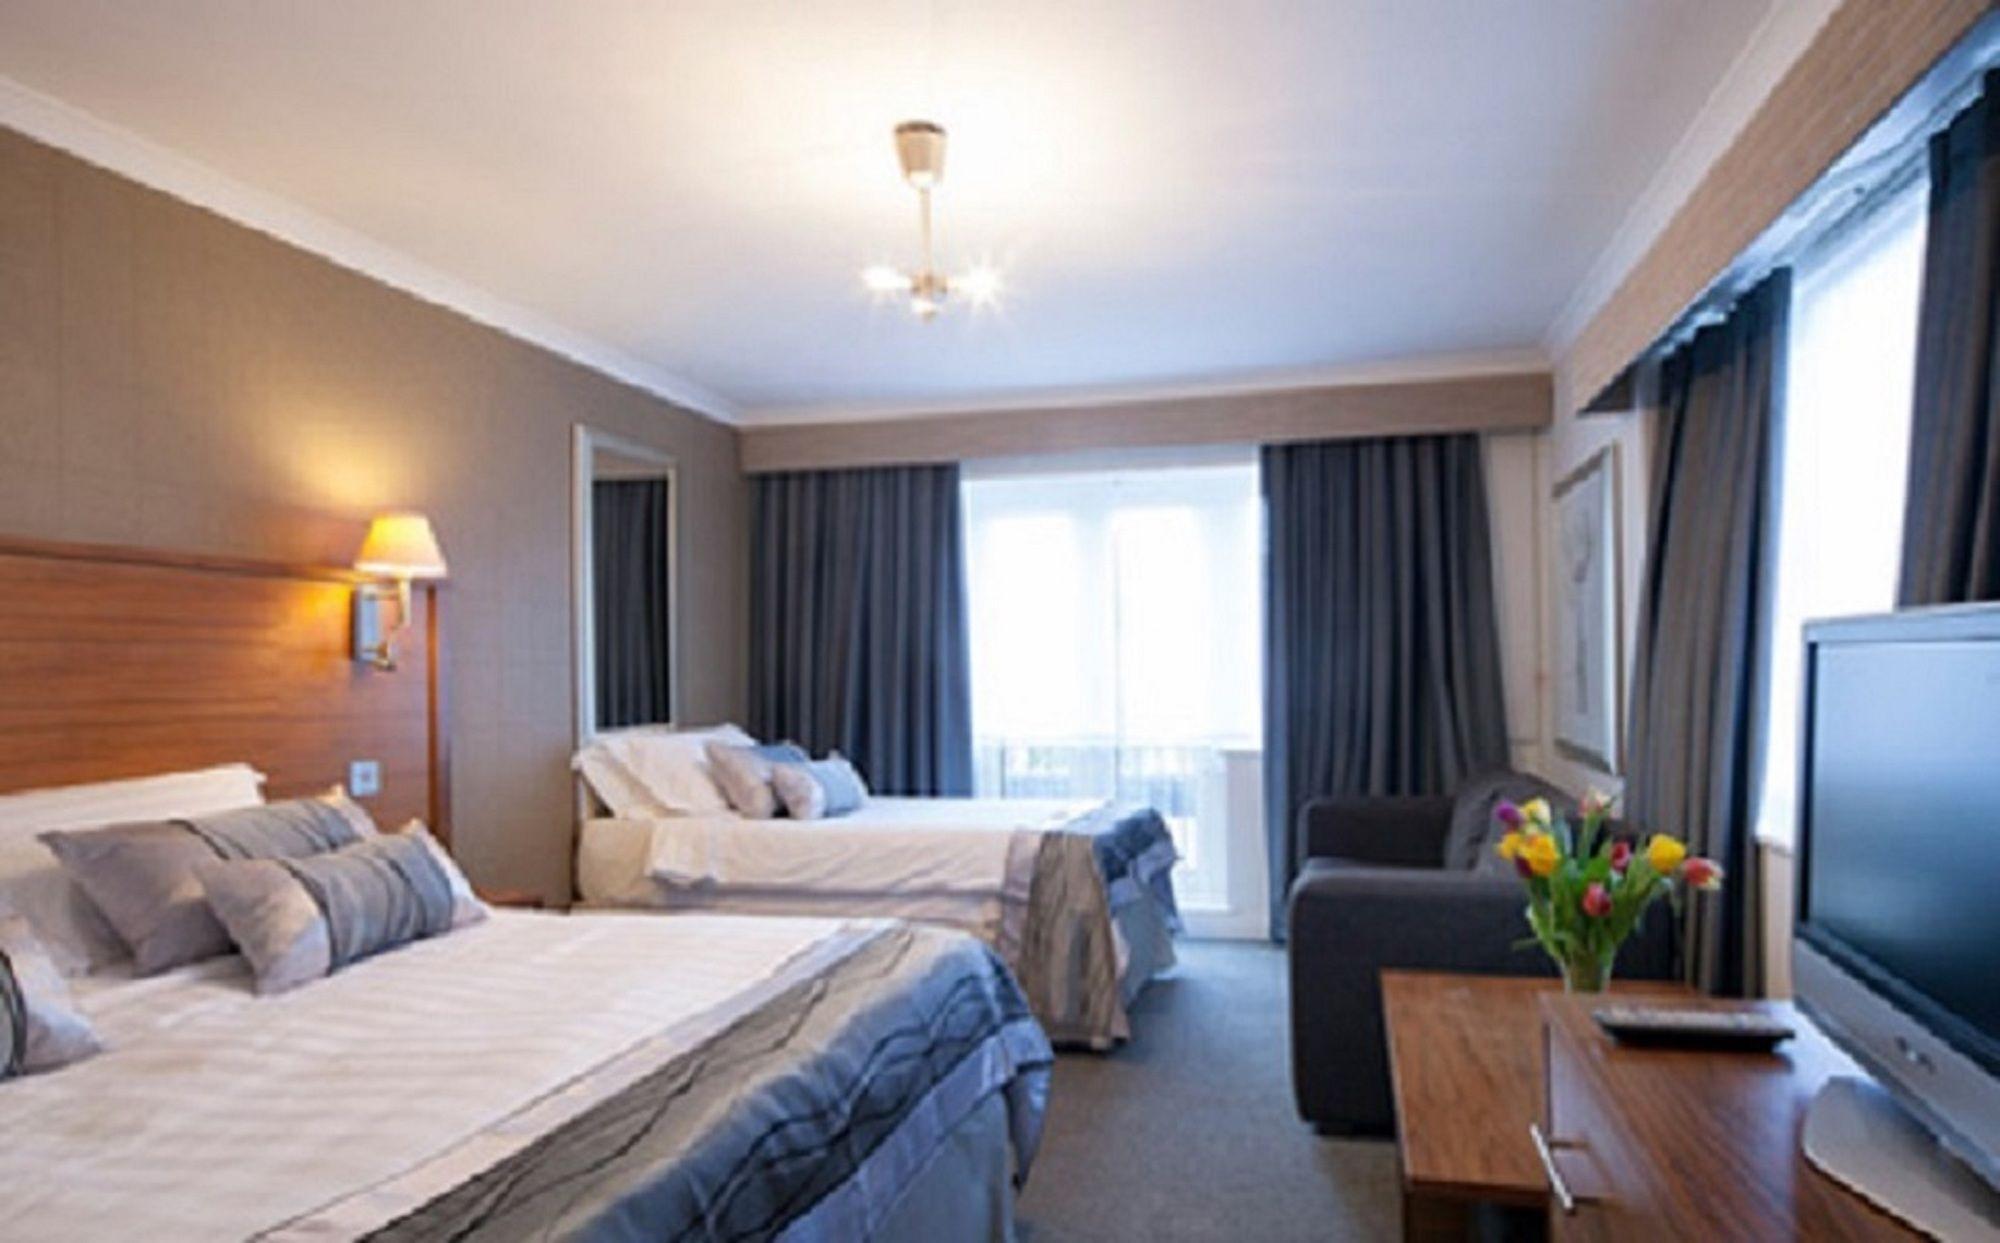 The New London Carlton Hotel & Service Apartments, London